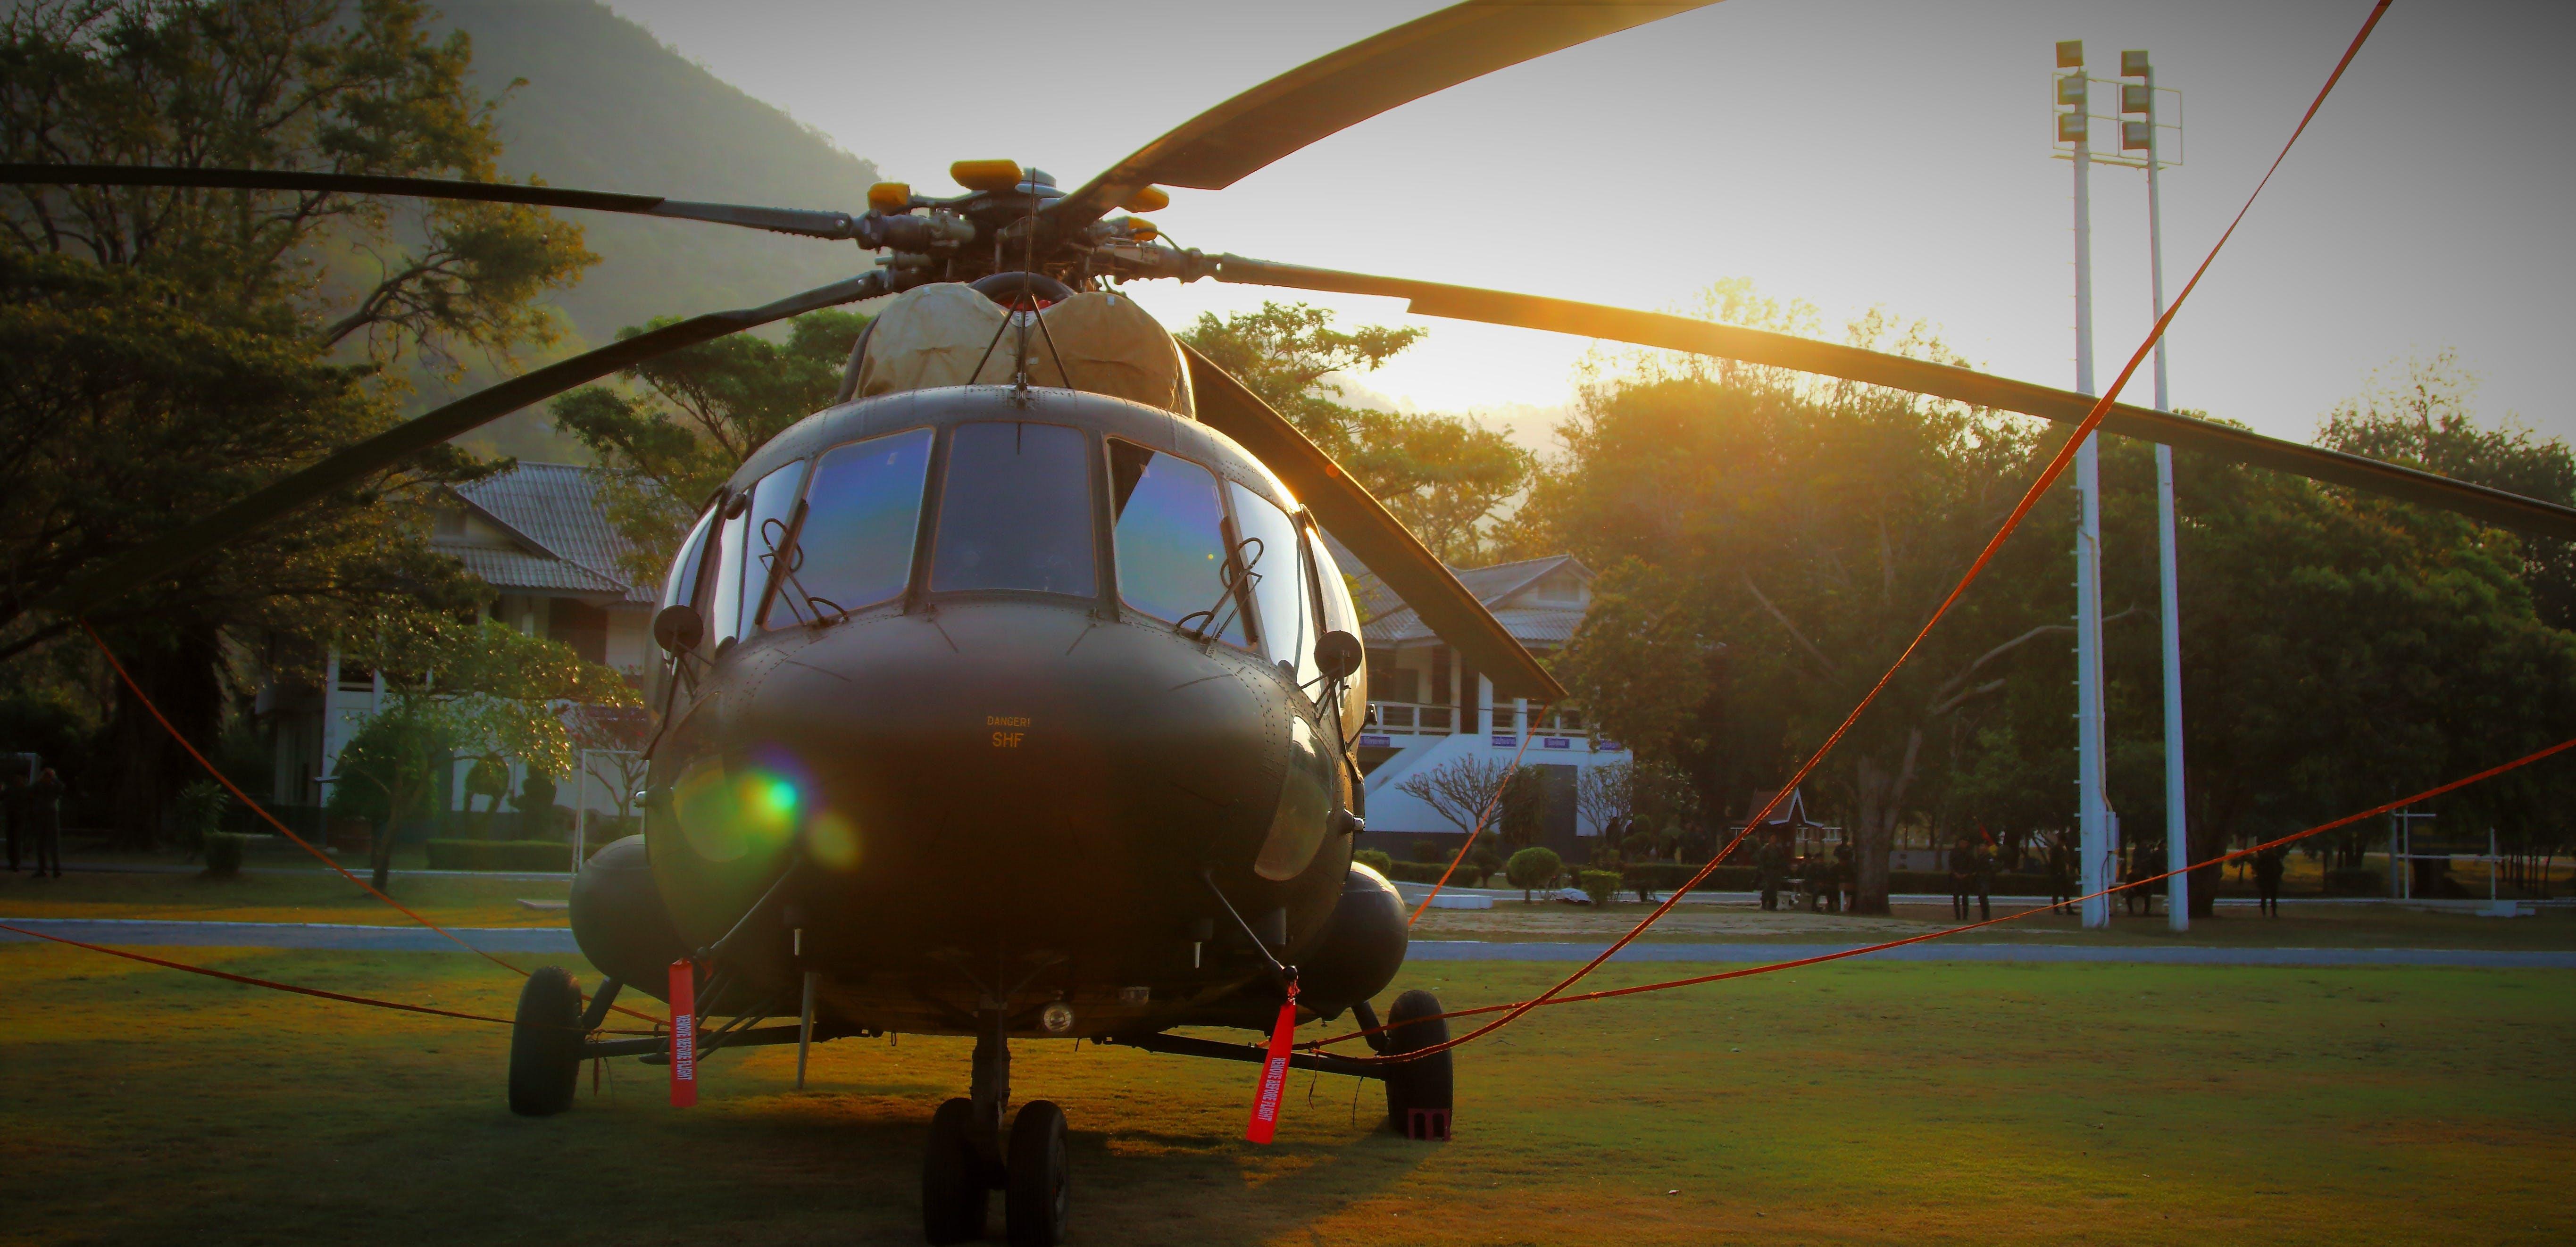 Black Chopper on Green Grass Lawn during Daytime